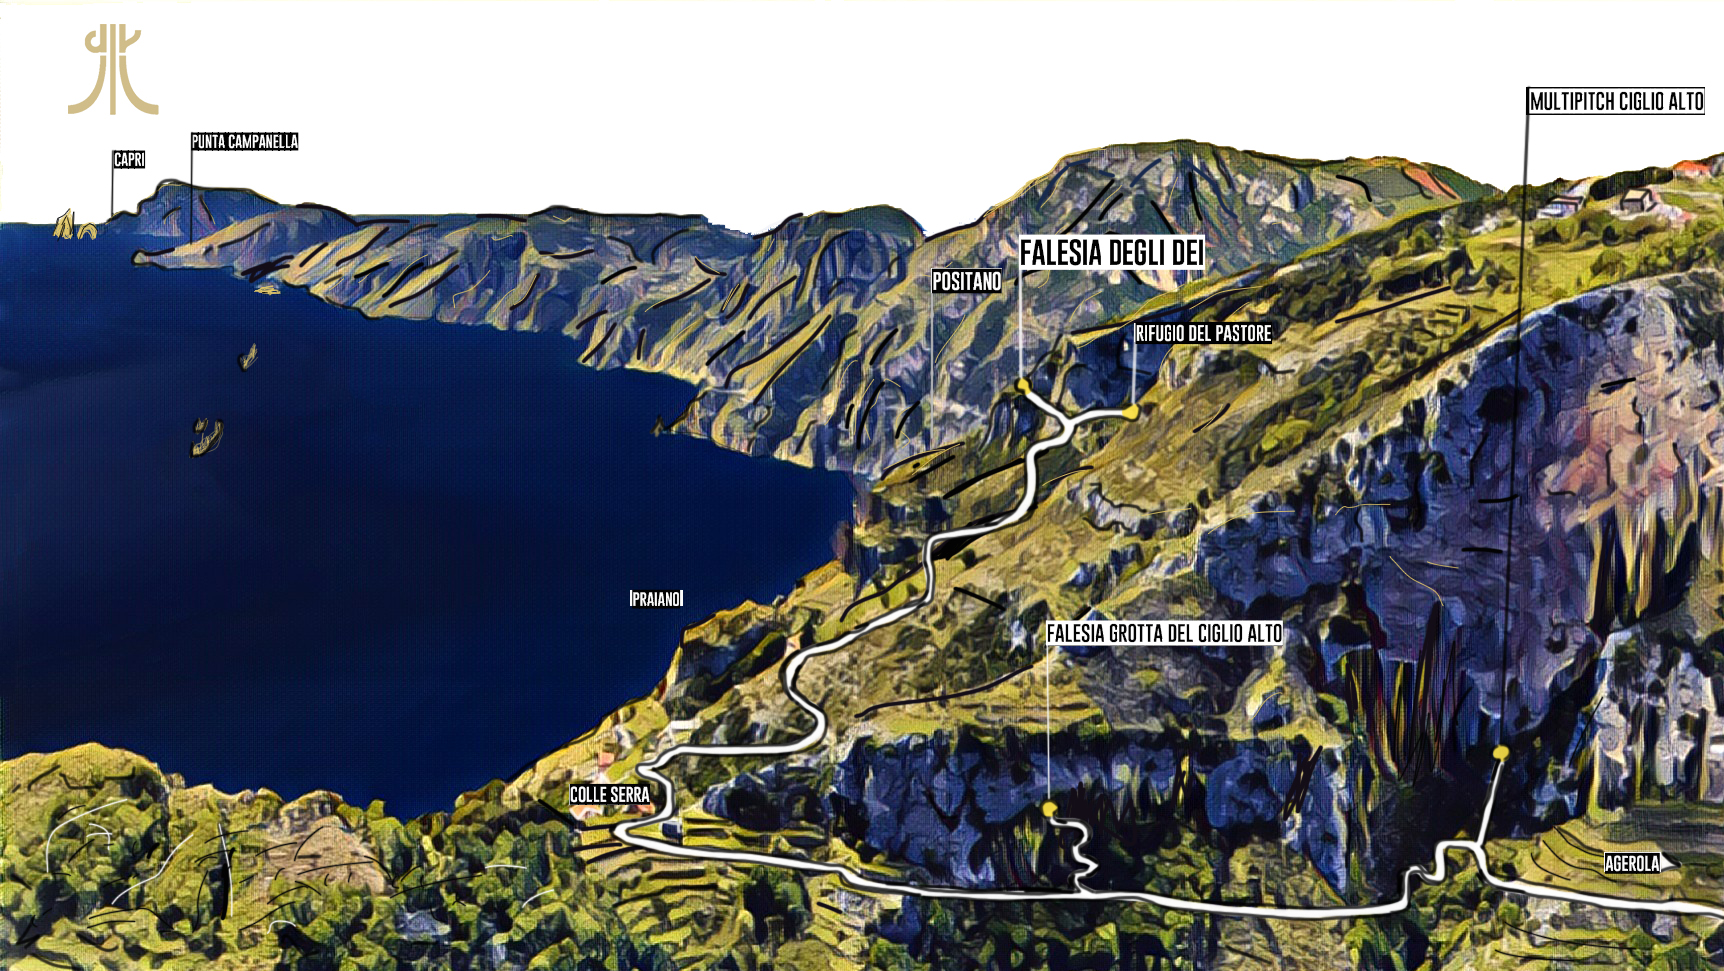 (Italiano) climbing retreat sentiero degli dei – path of the gods @ sheperd huts oct 21